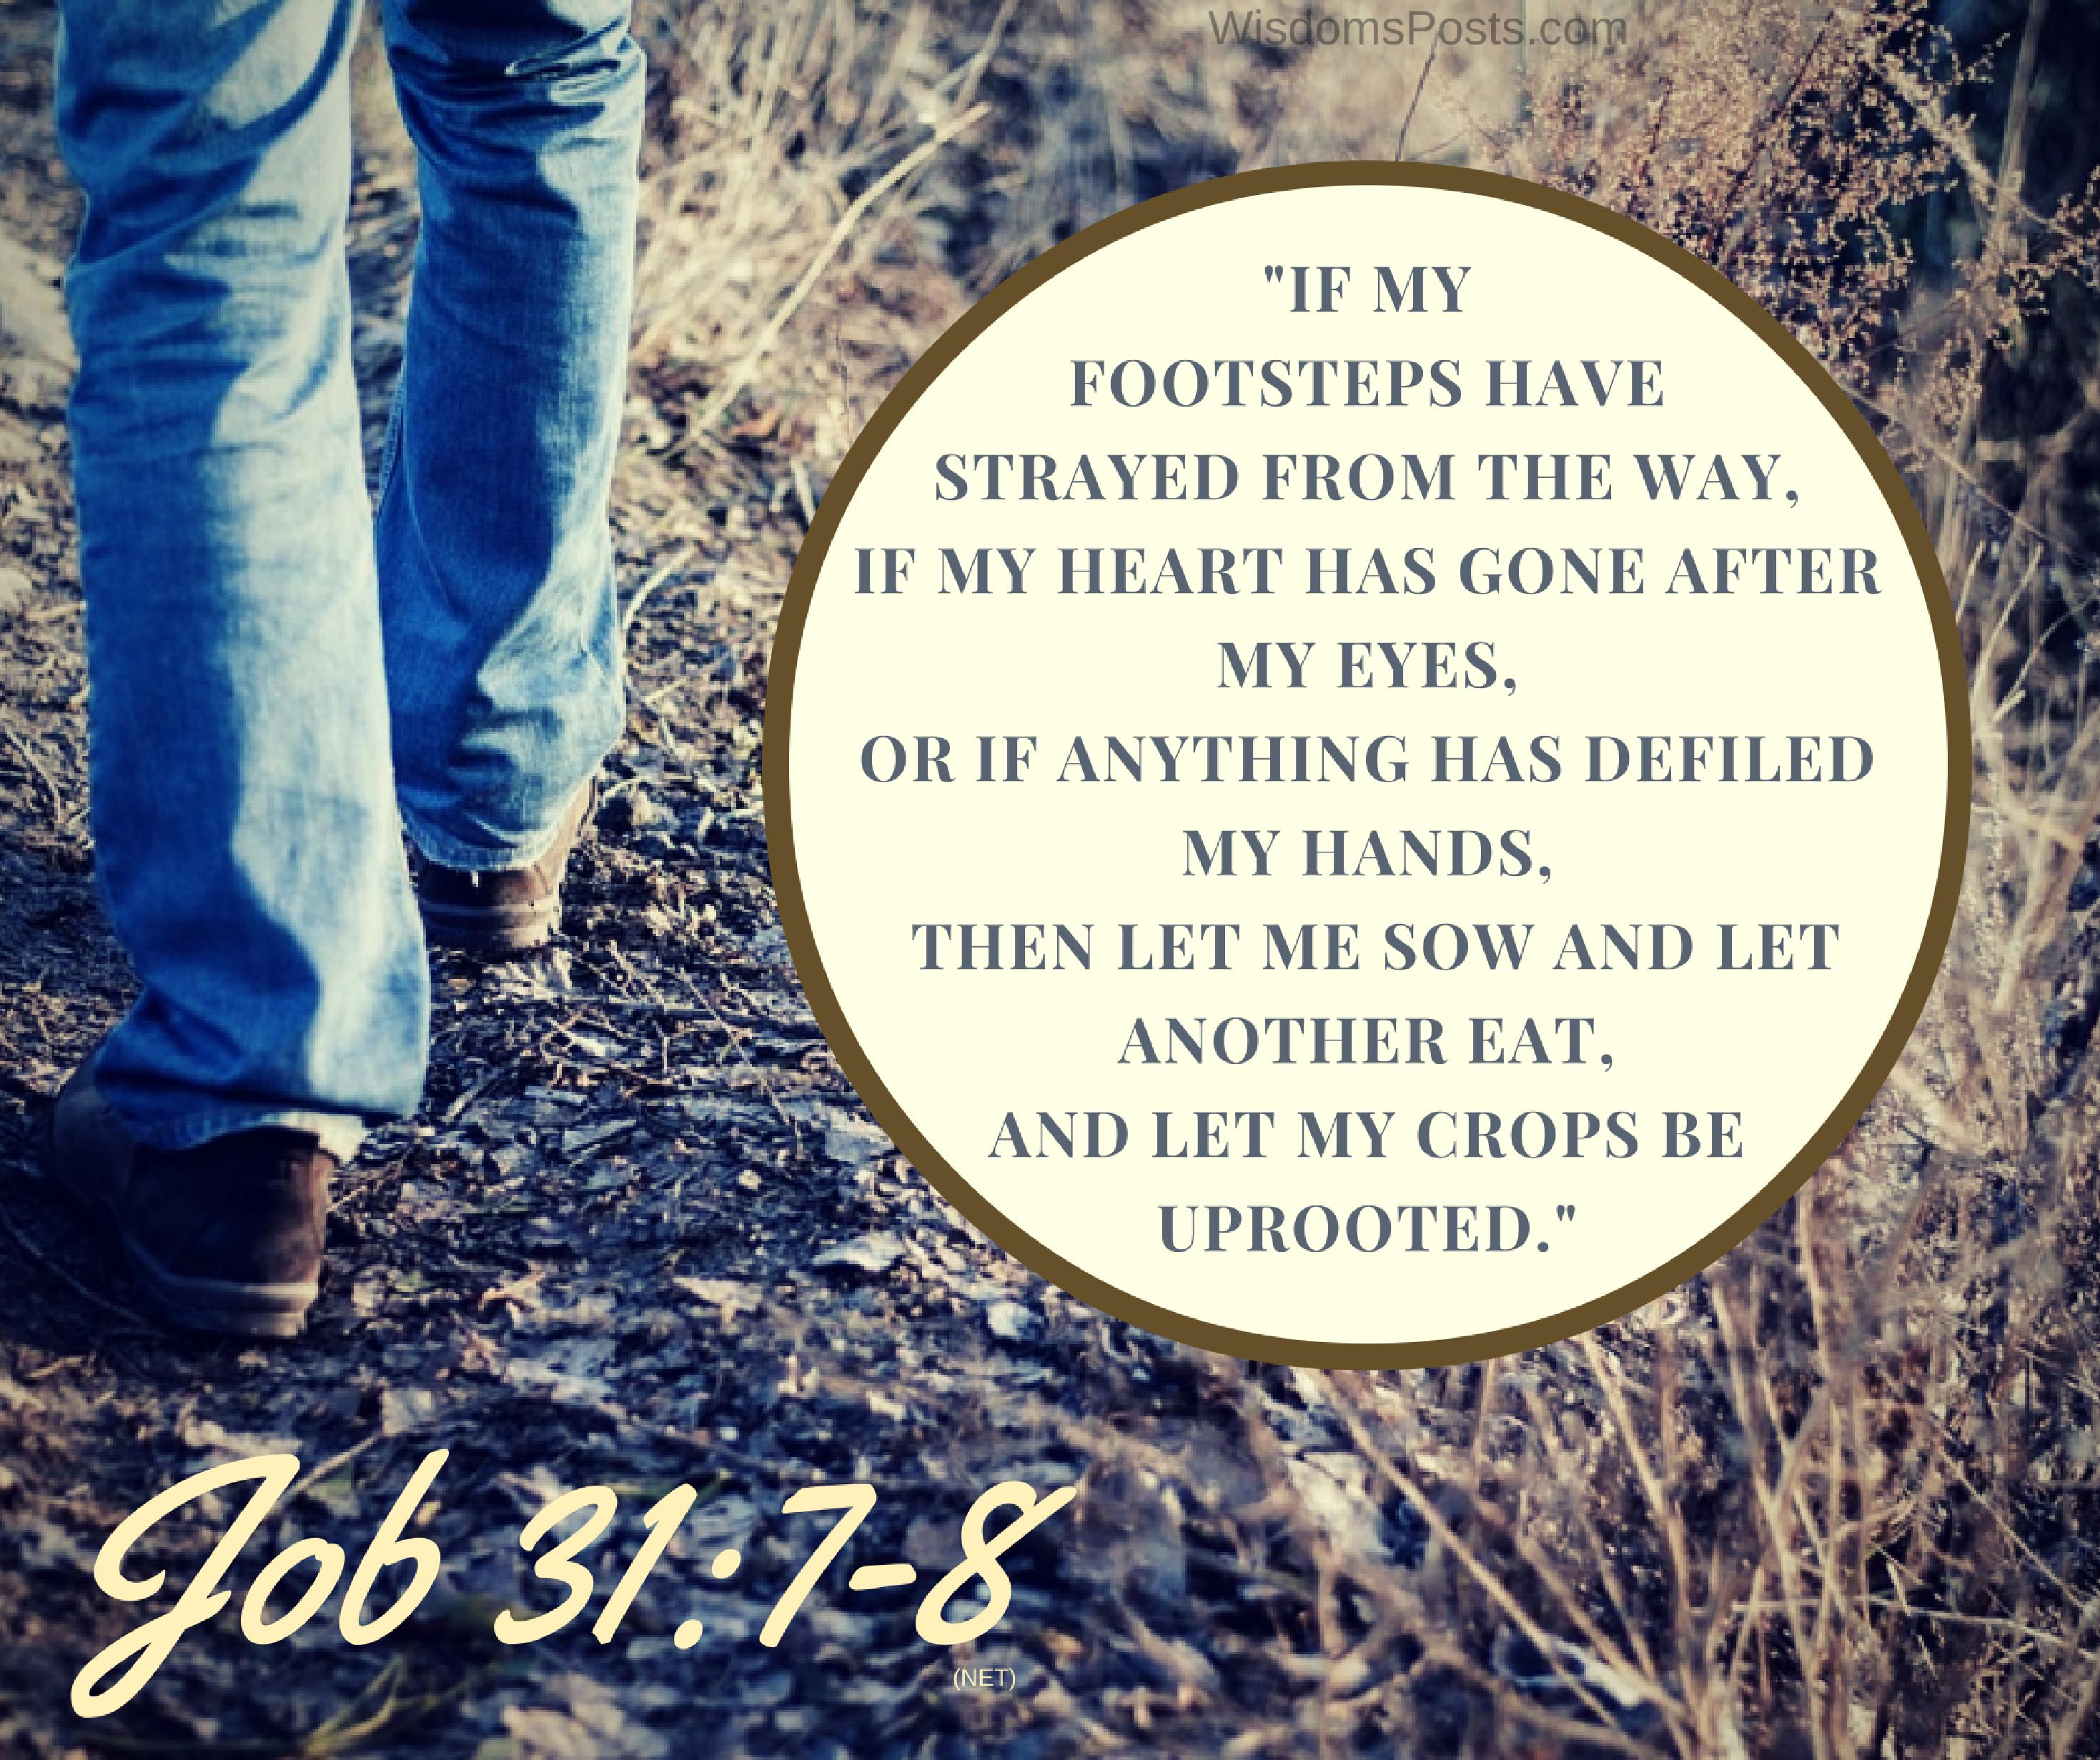 Job 31:7-8 | Job 31 - The Righteous Man | Windows xp product